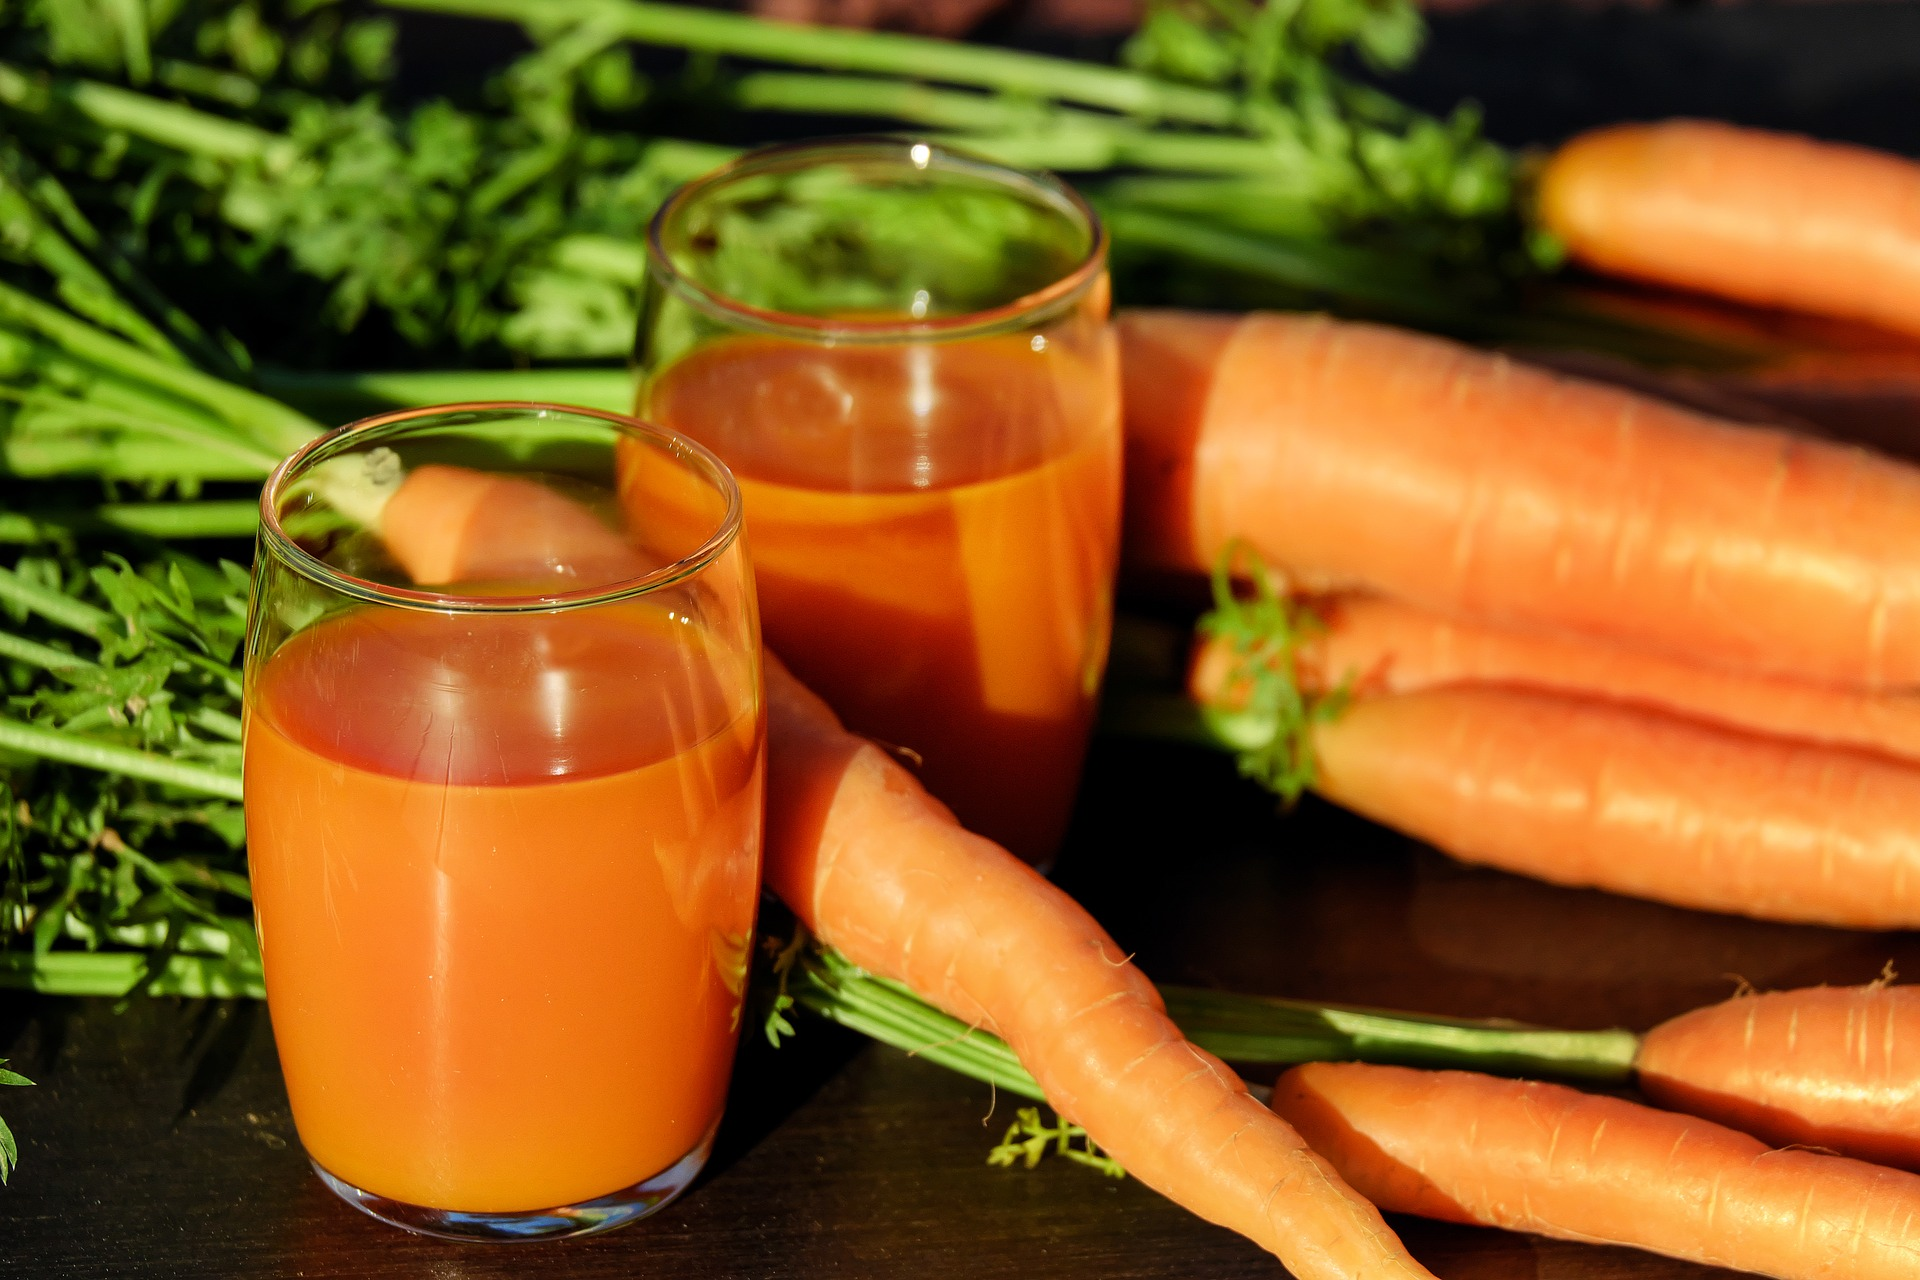 mejorar la salud ocular dieta sana